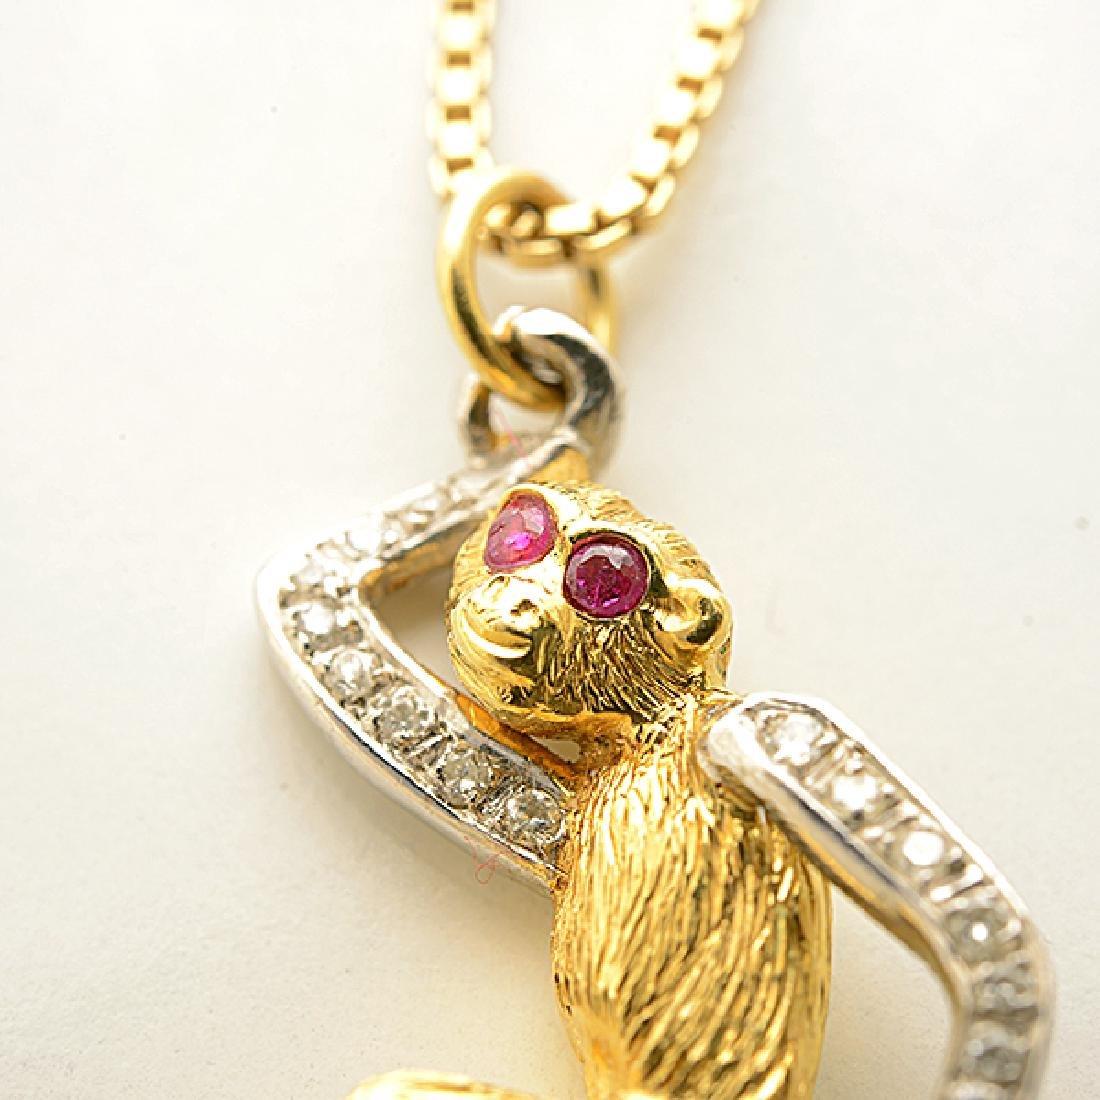 Diamond, Ruby, Gold Monkey Pendant Necklace. - 2